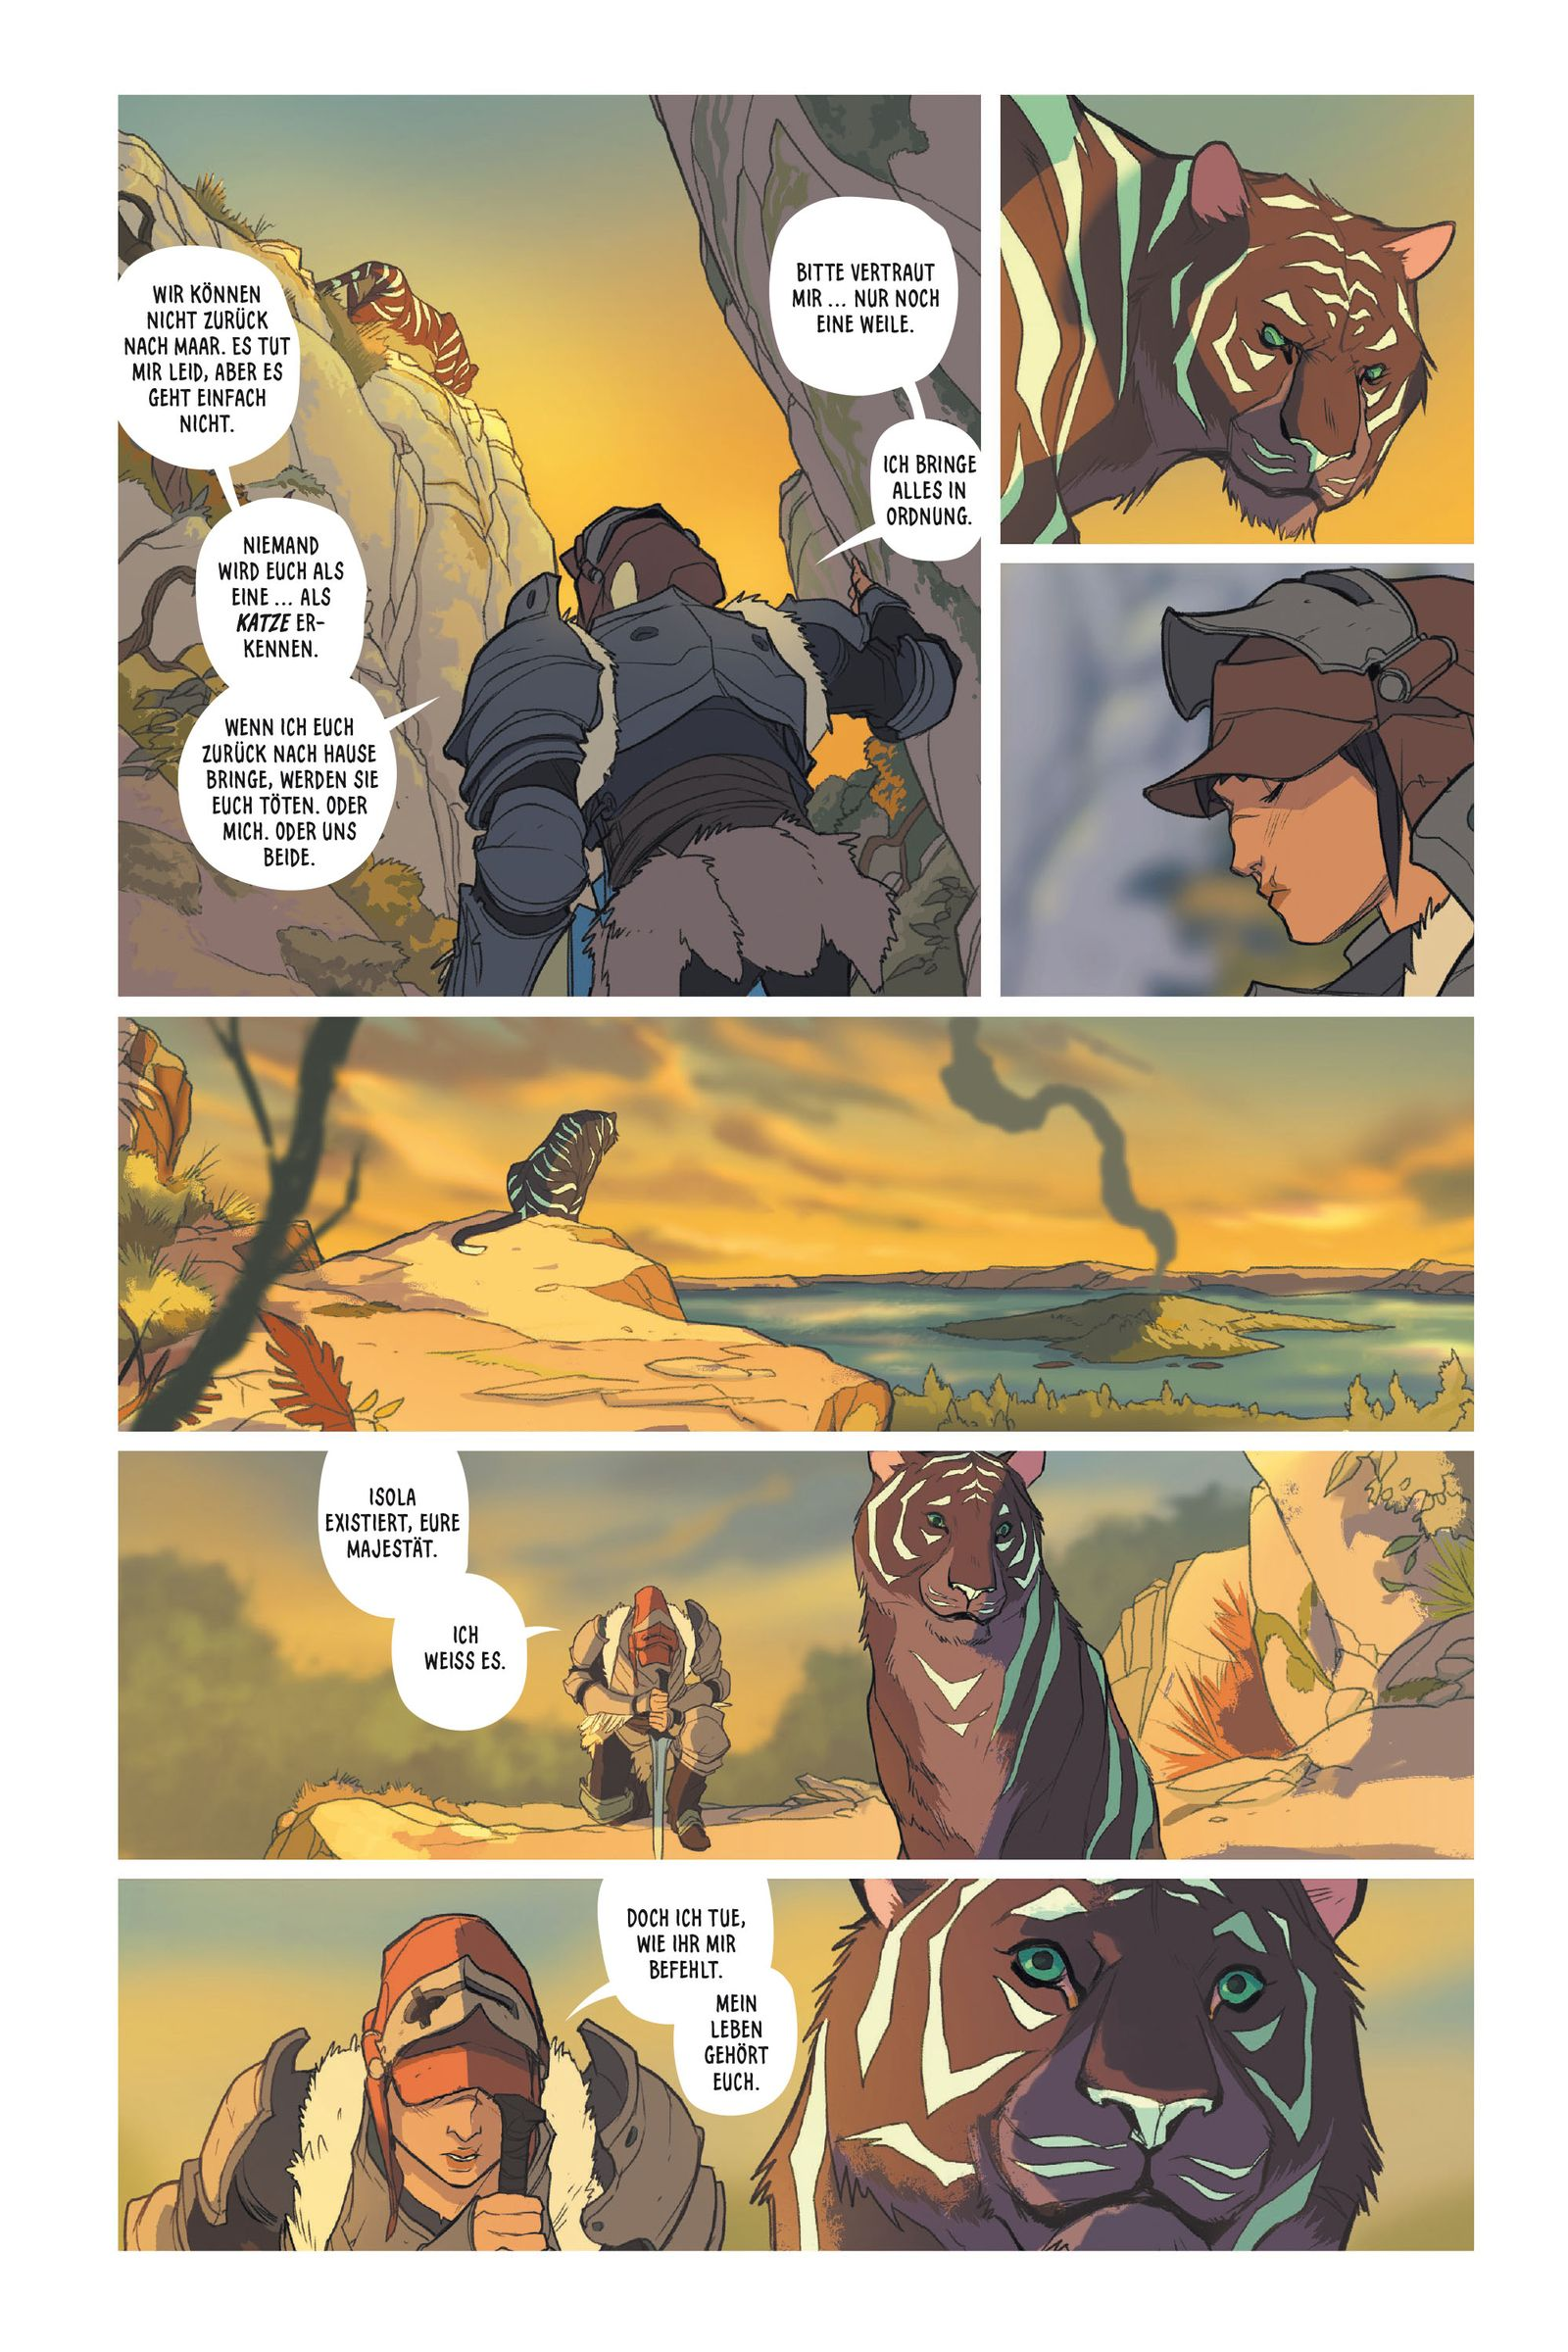 EINMALIGE VERWENDUNG Kultur/ Comics/ Isola